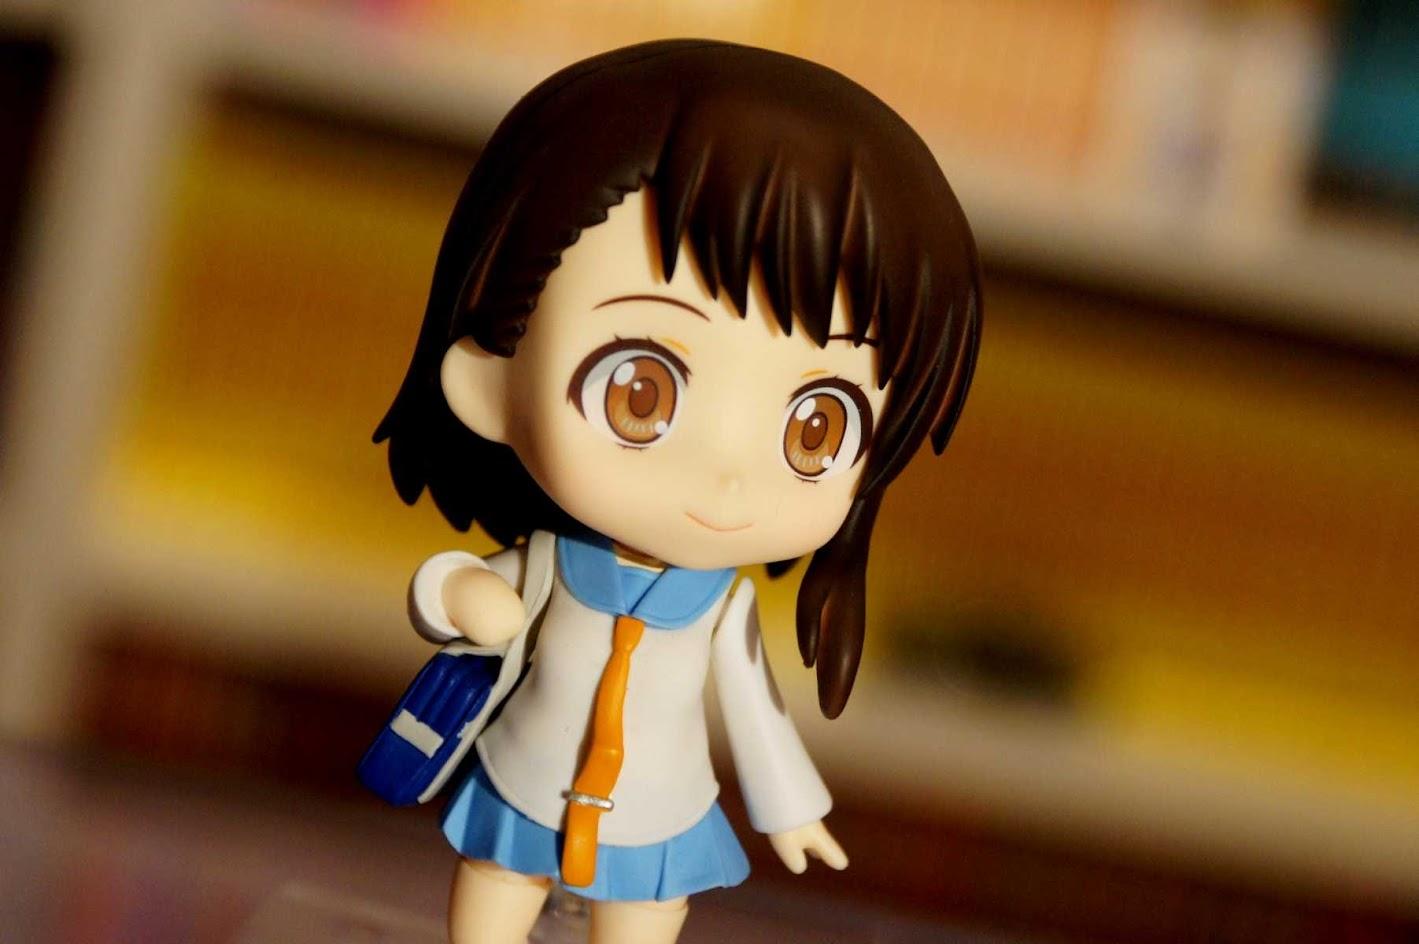 Nisekoi - Onodera Kosaki - Nendoroid #457 (Good Smile Company)